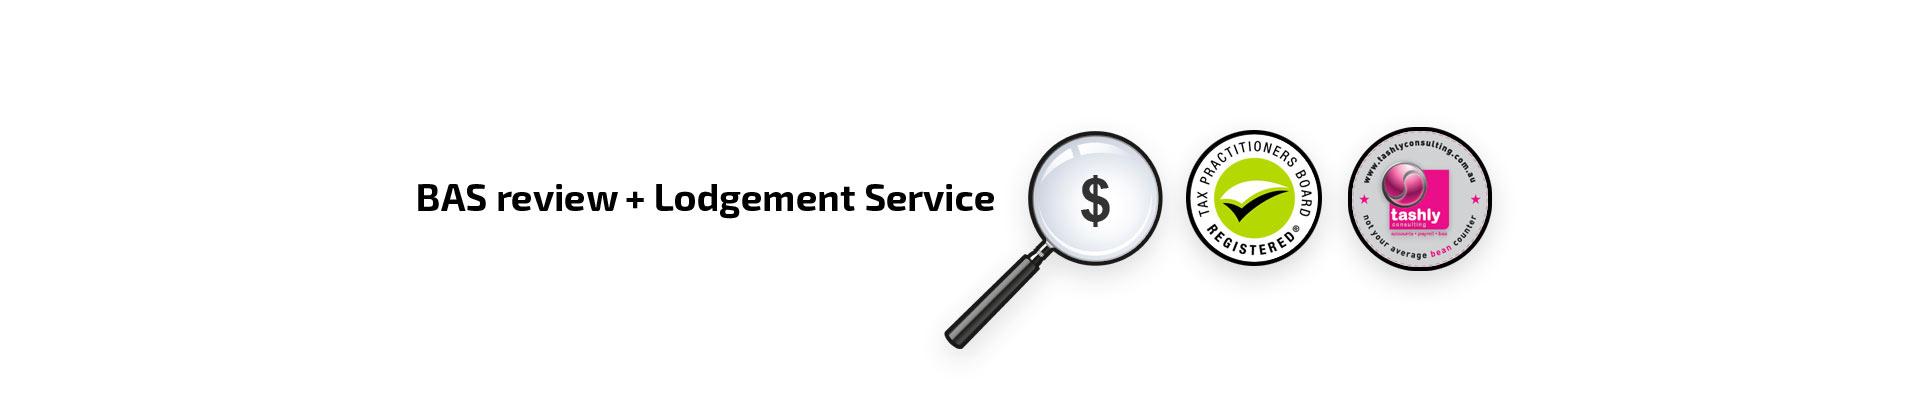 Tashly Bookkeepers Blog - BAS lodgement